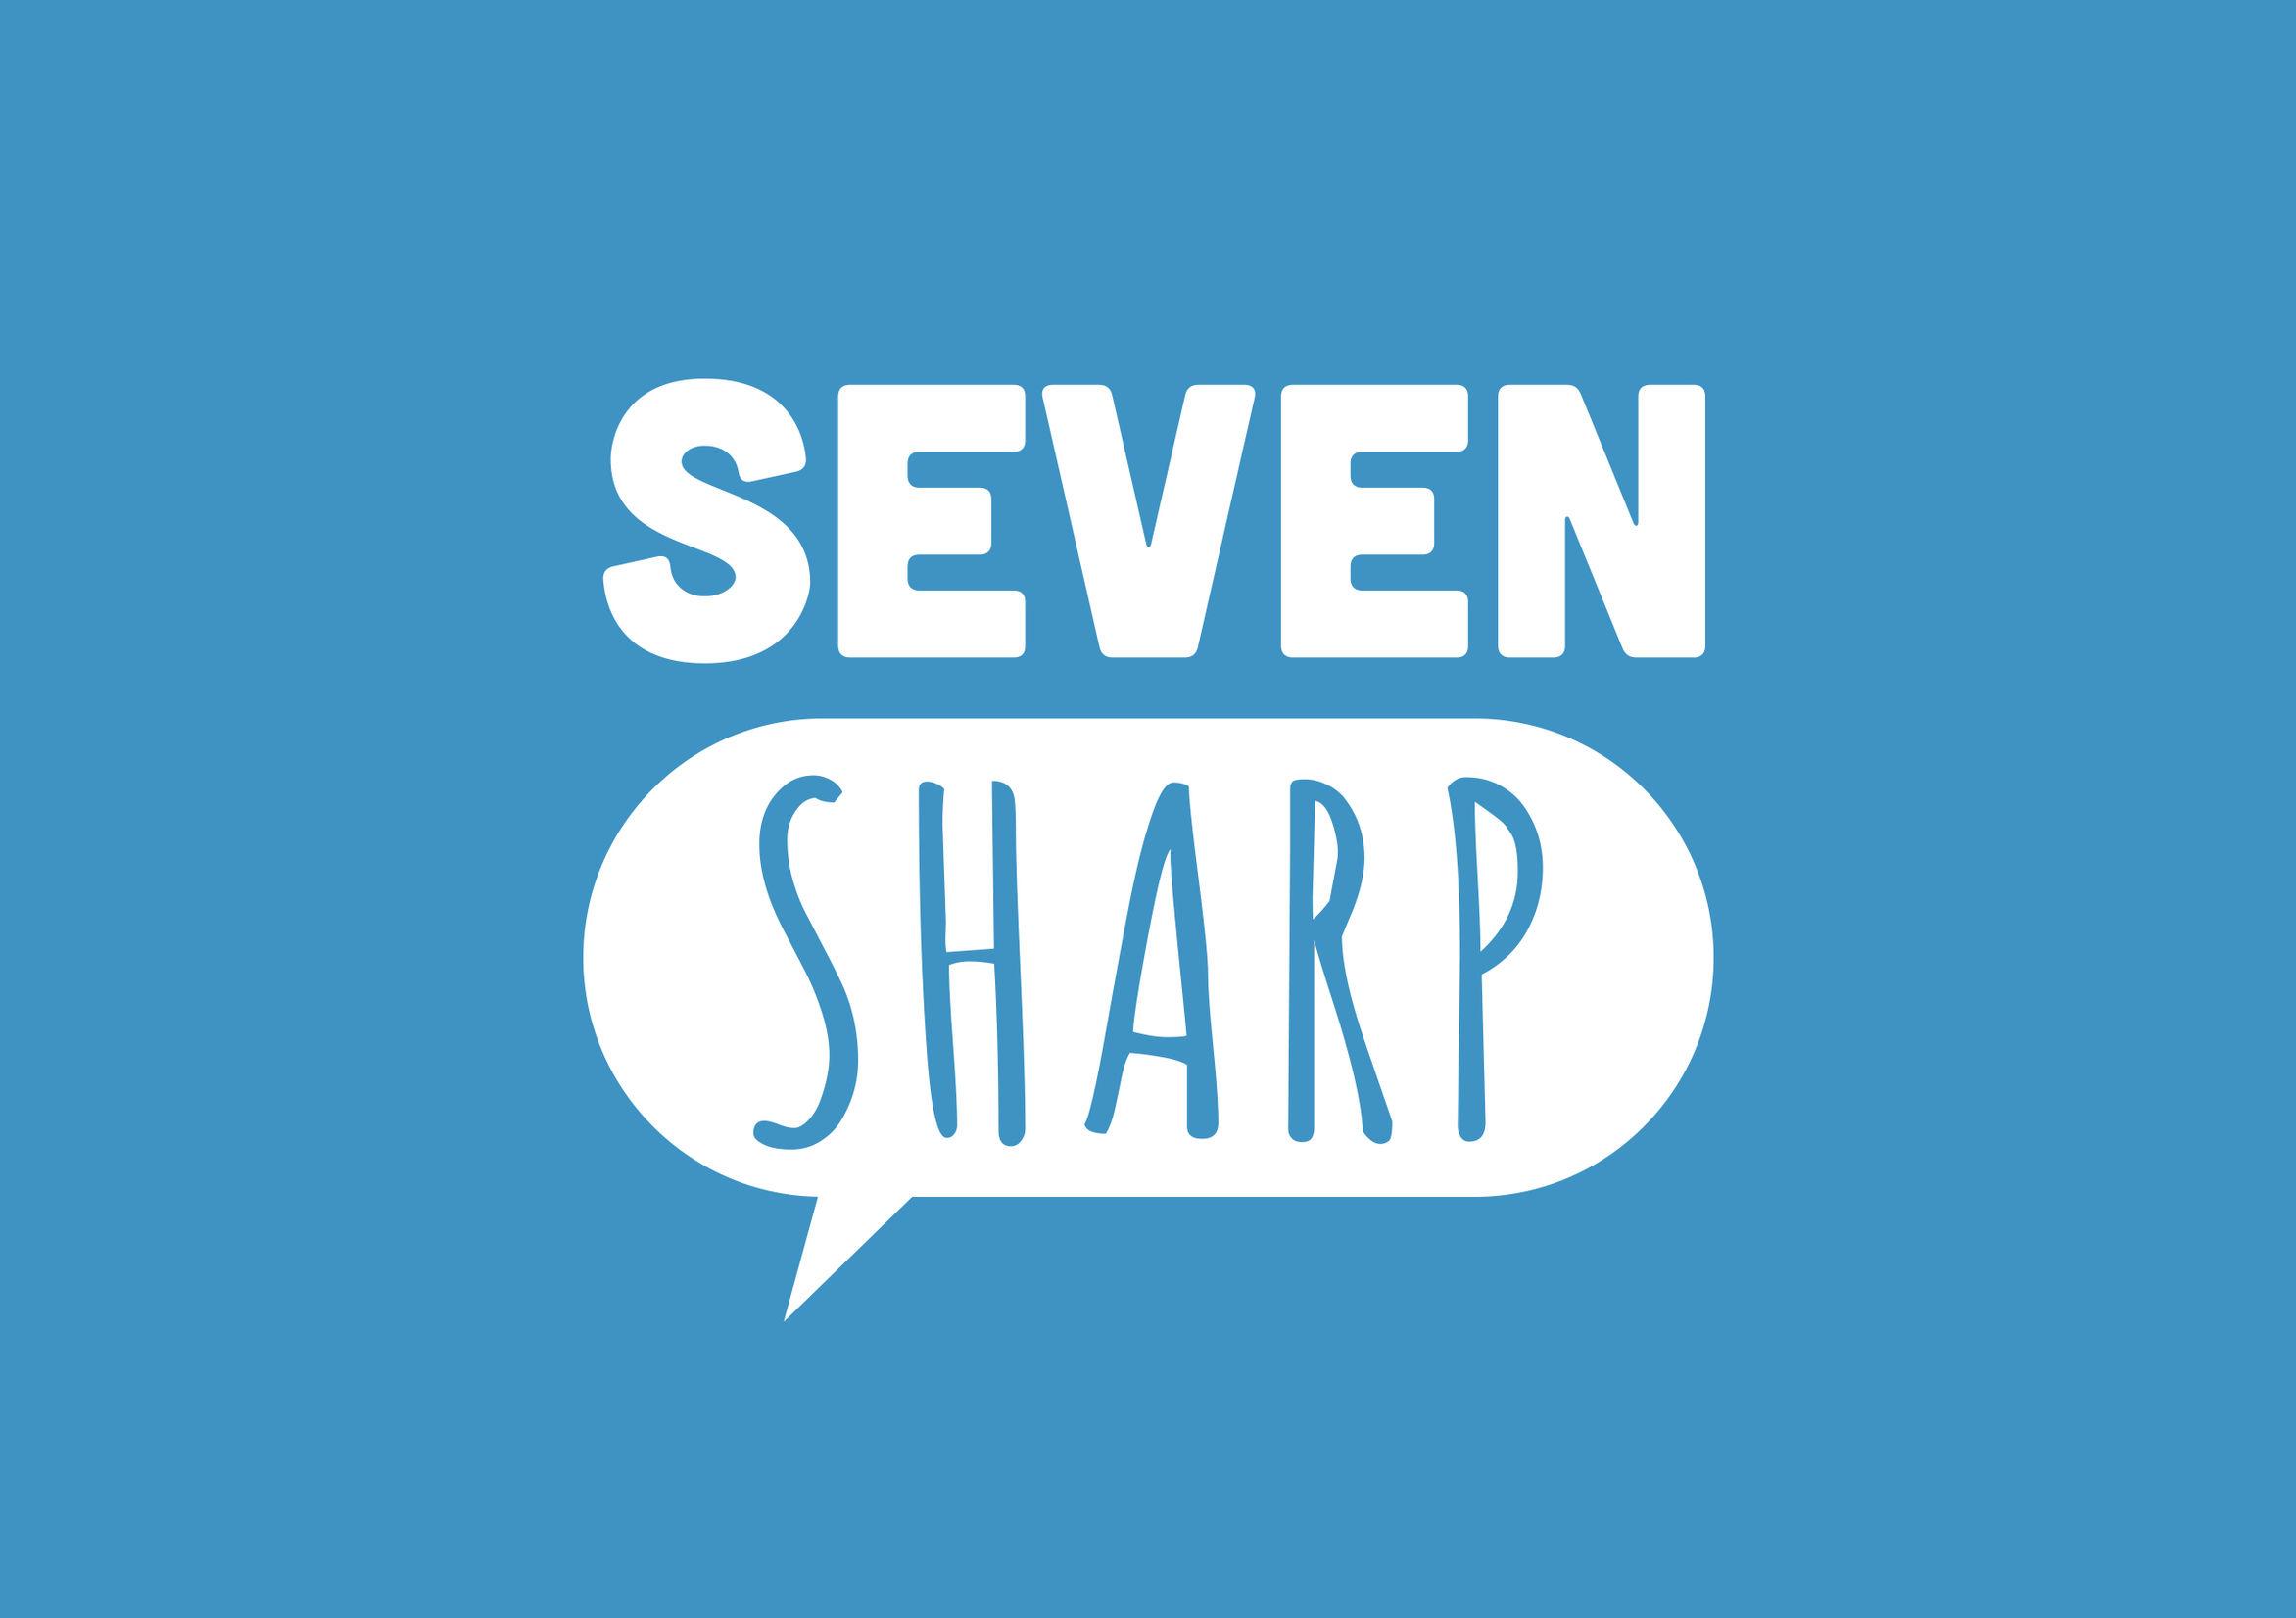 SevenSharp_1-0-2344-0-1652.jpg